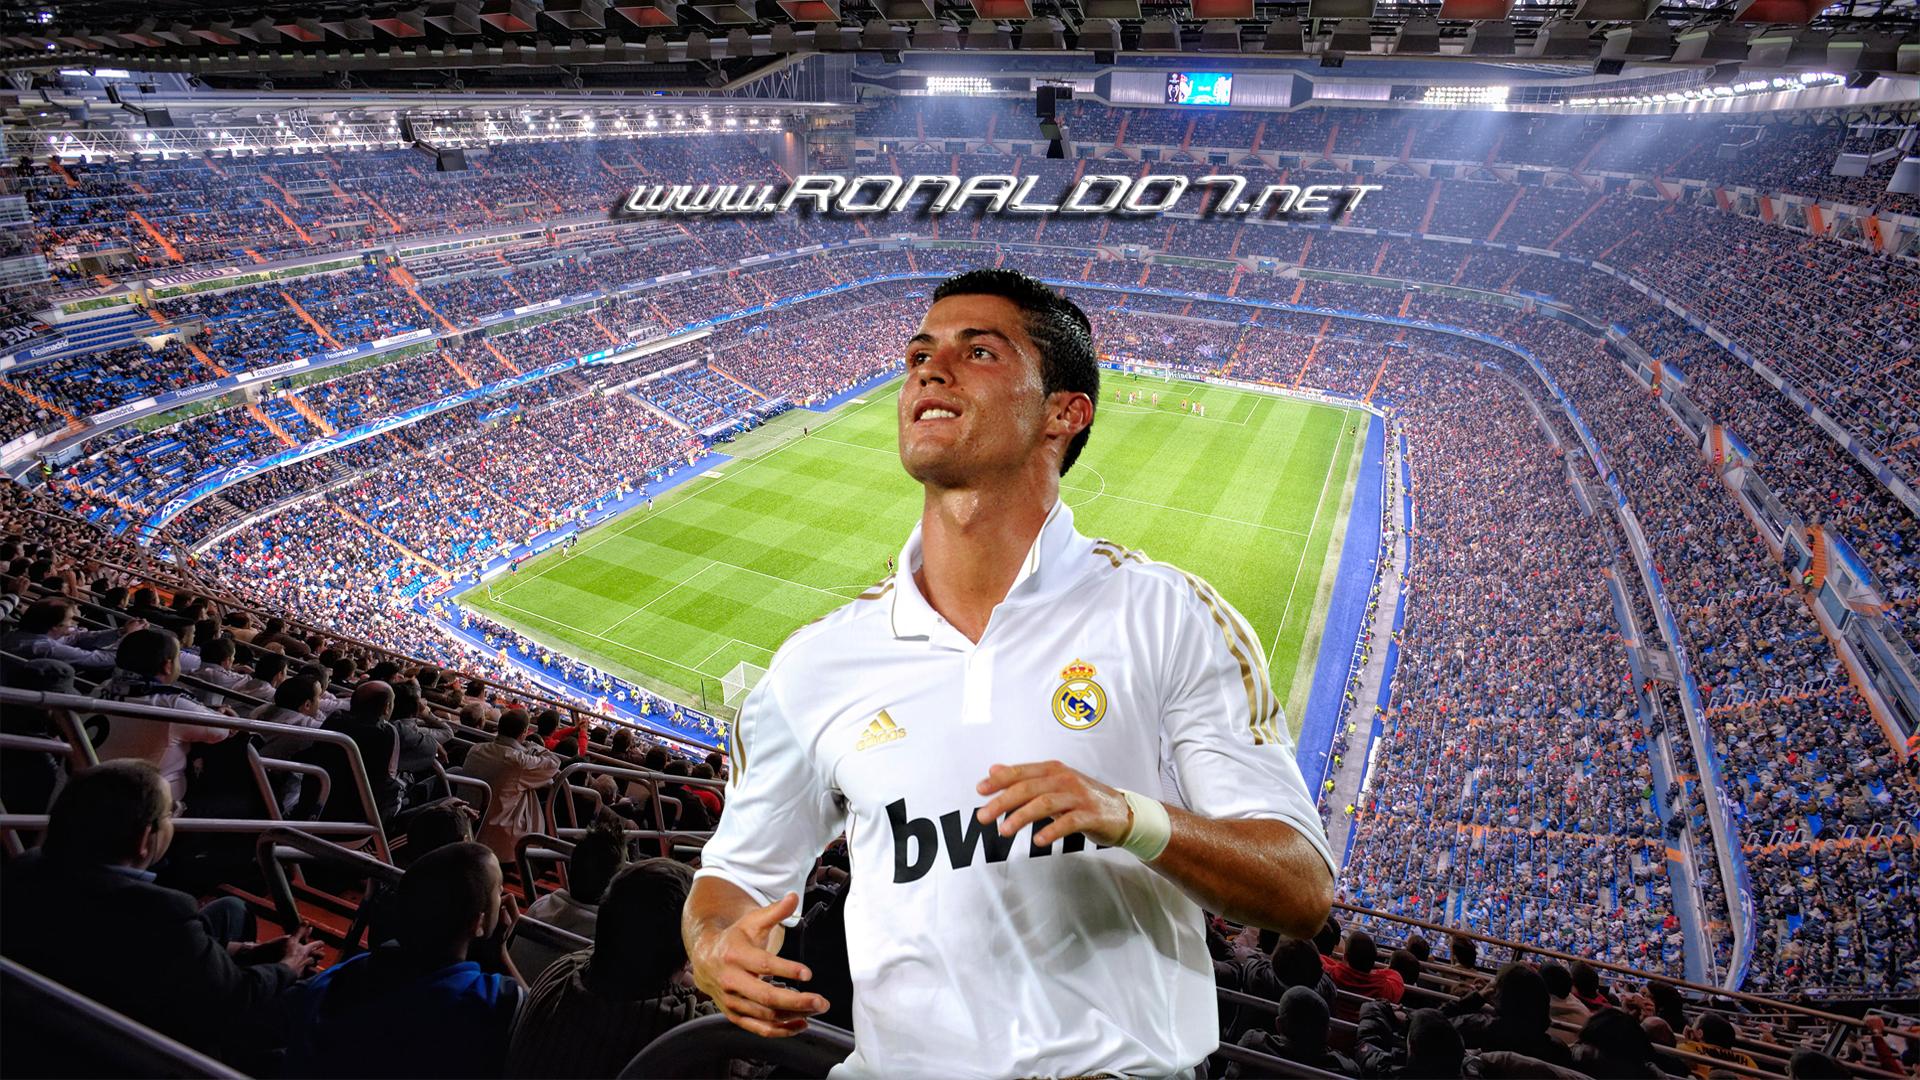 Cristiano Ronaldo wallpaper full hd 1920x1080 - Real Madrid greatness